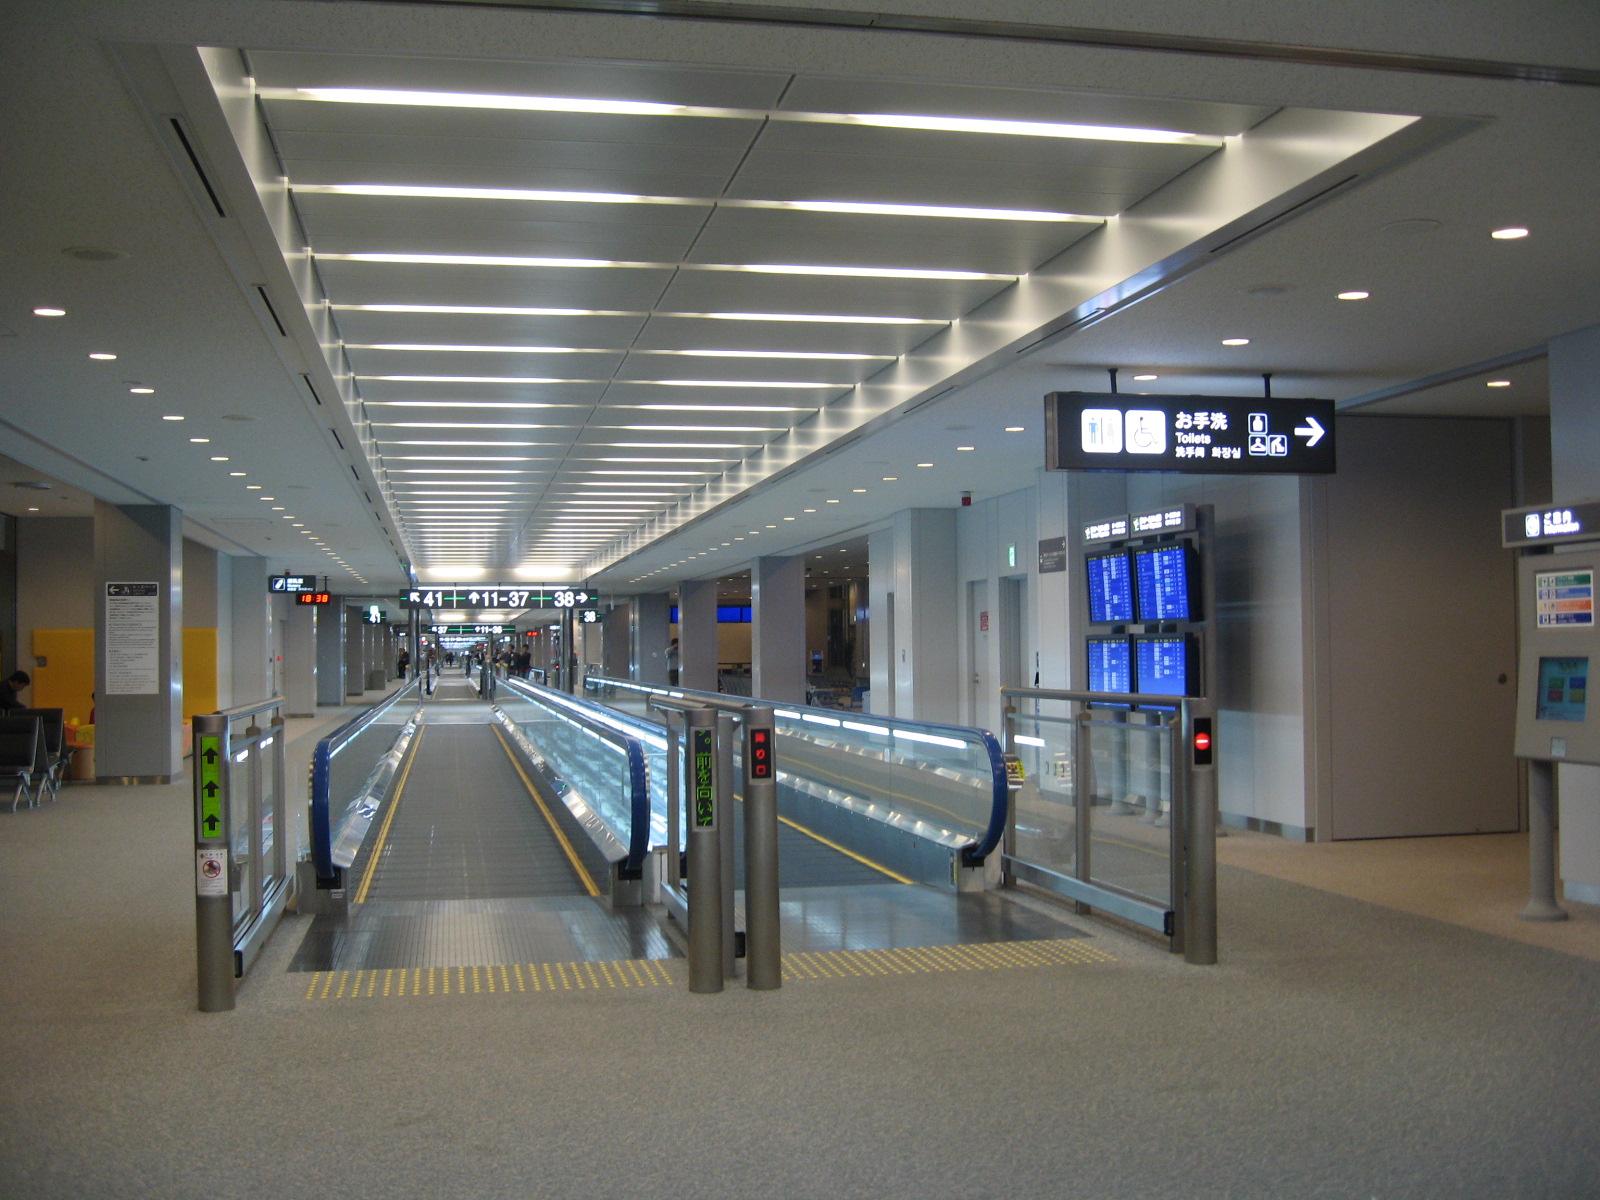 Airport terminal clipart.